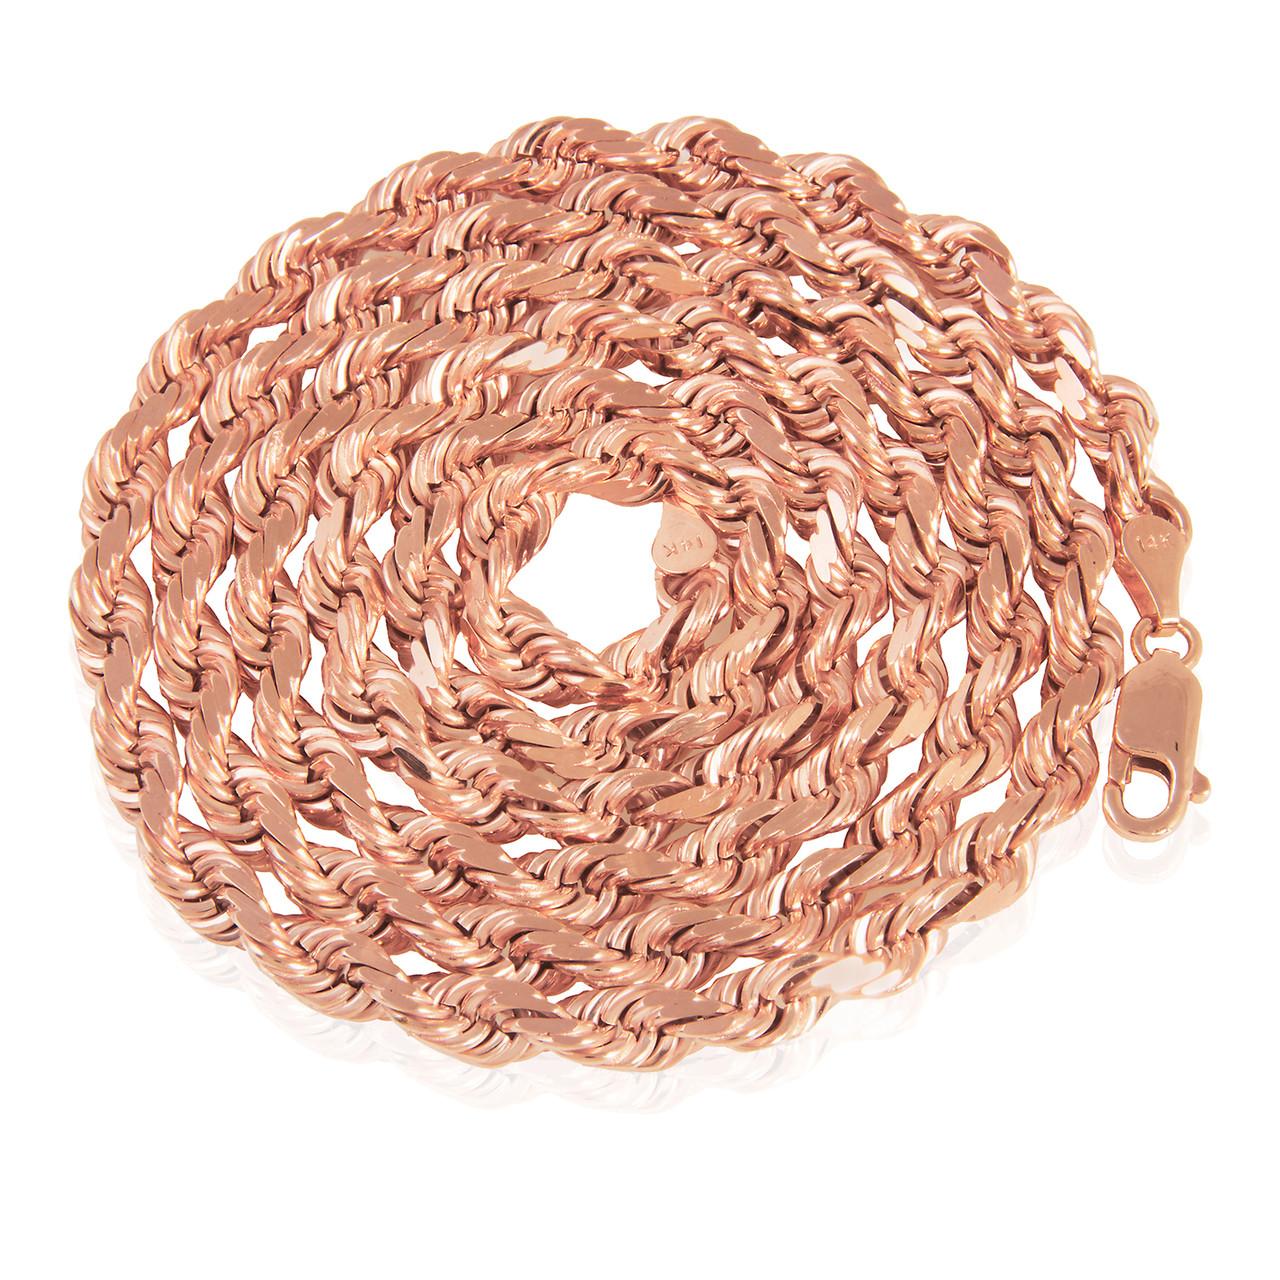 14k Rose Gold Rope Chain - Shyne Jewelers 4e925d64e419